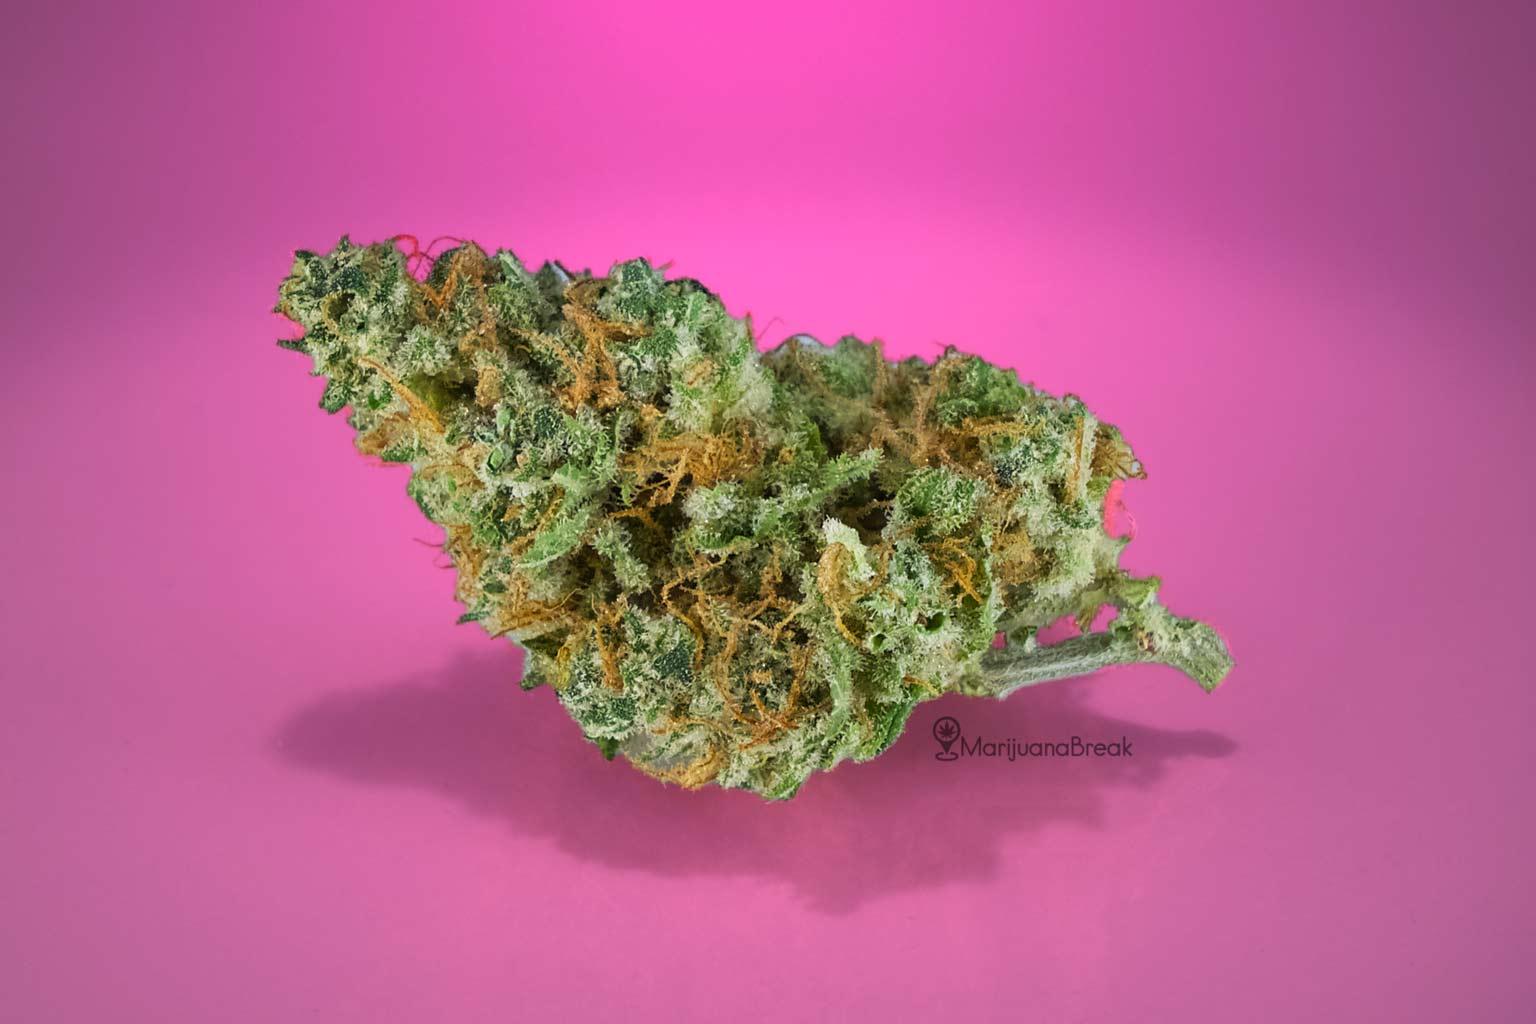 Sweet Tooth Cannabis Strain